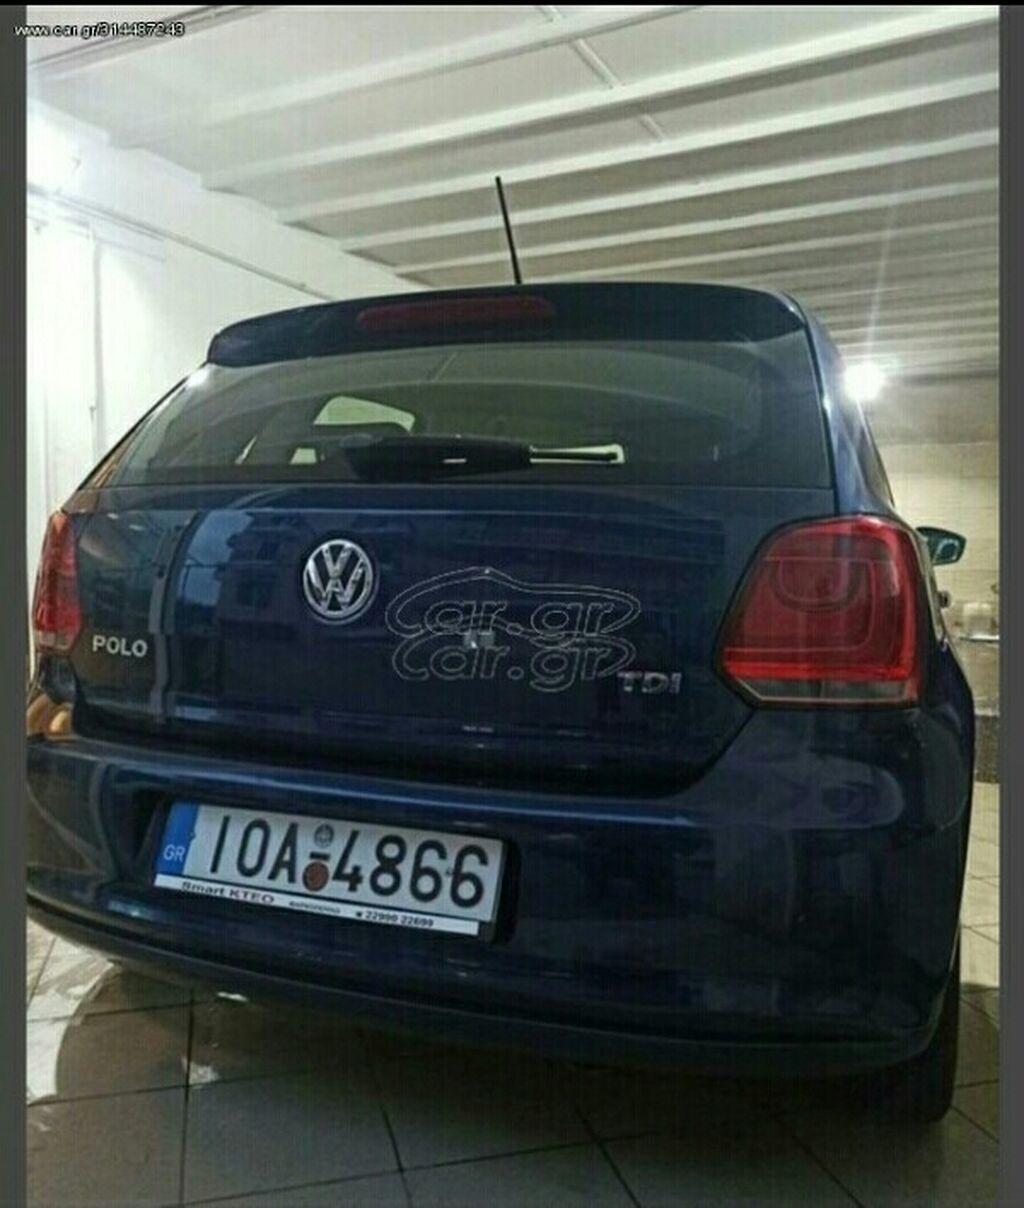 Volkswagen 1.2 l. 2012 | 200000 km | η αγγελία δημοσιεύτηκε 18 Ιούλιος 2021 16:38:21: Volkswagen 1.2 l. 2012 | 200000 km